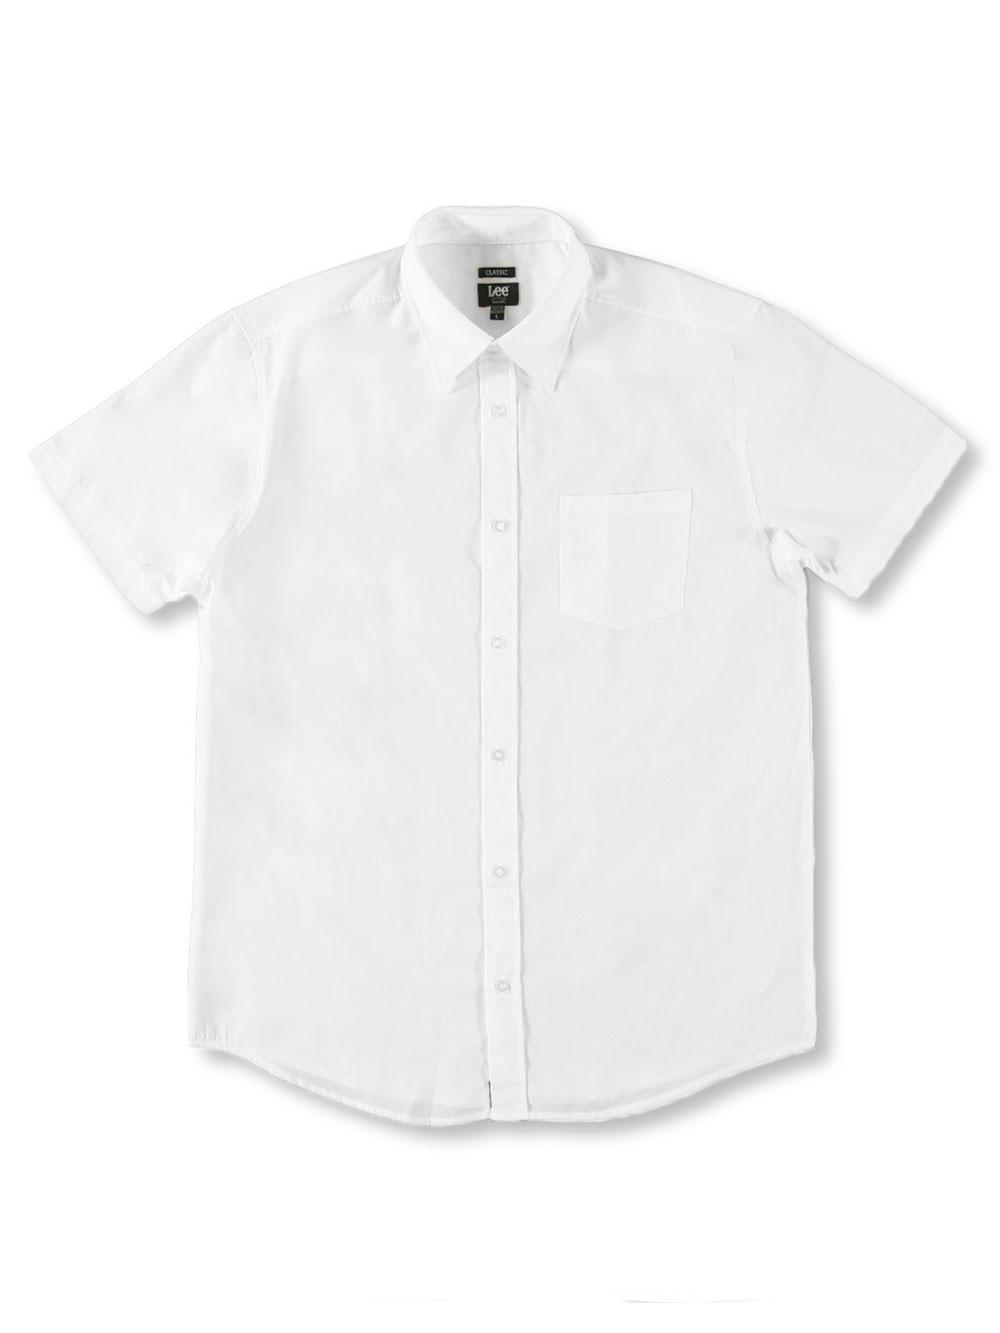 LEE Mens Uniforms S//S Button-Down Shirt White s